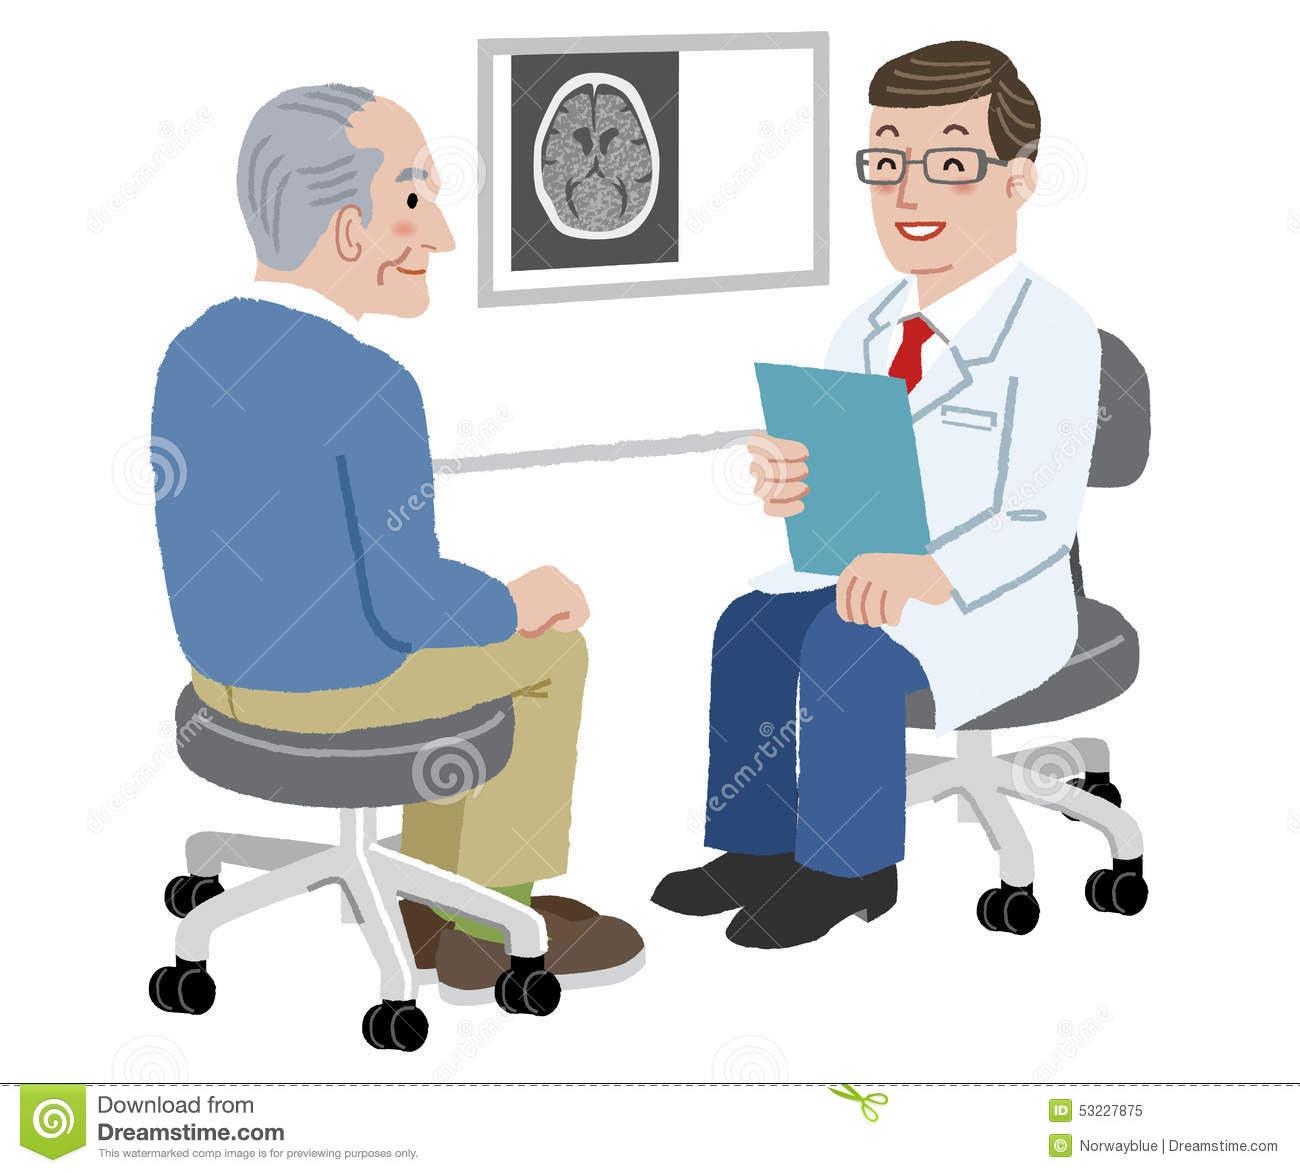 Doctor patient communication clipart 10 » Clipart Station.